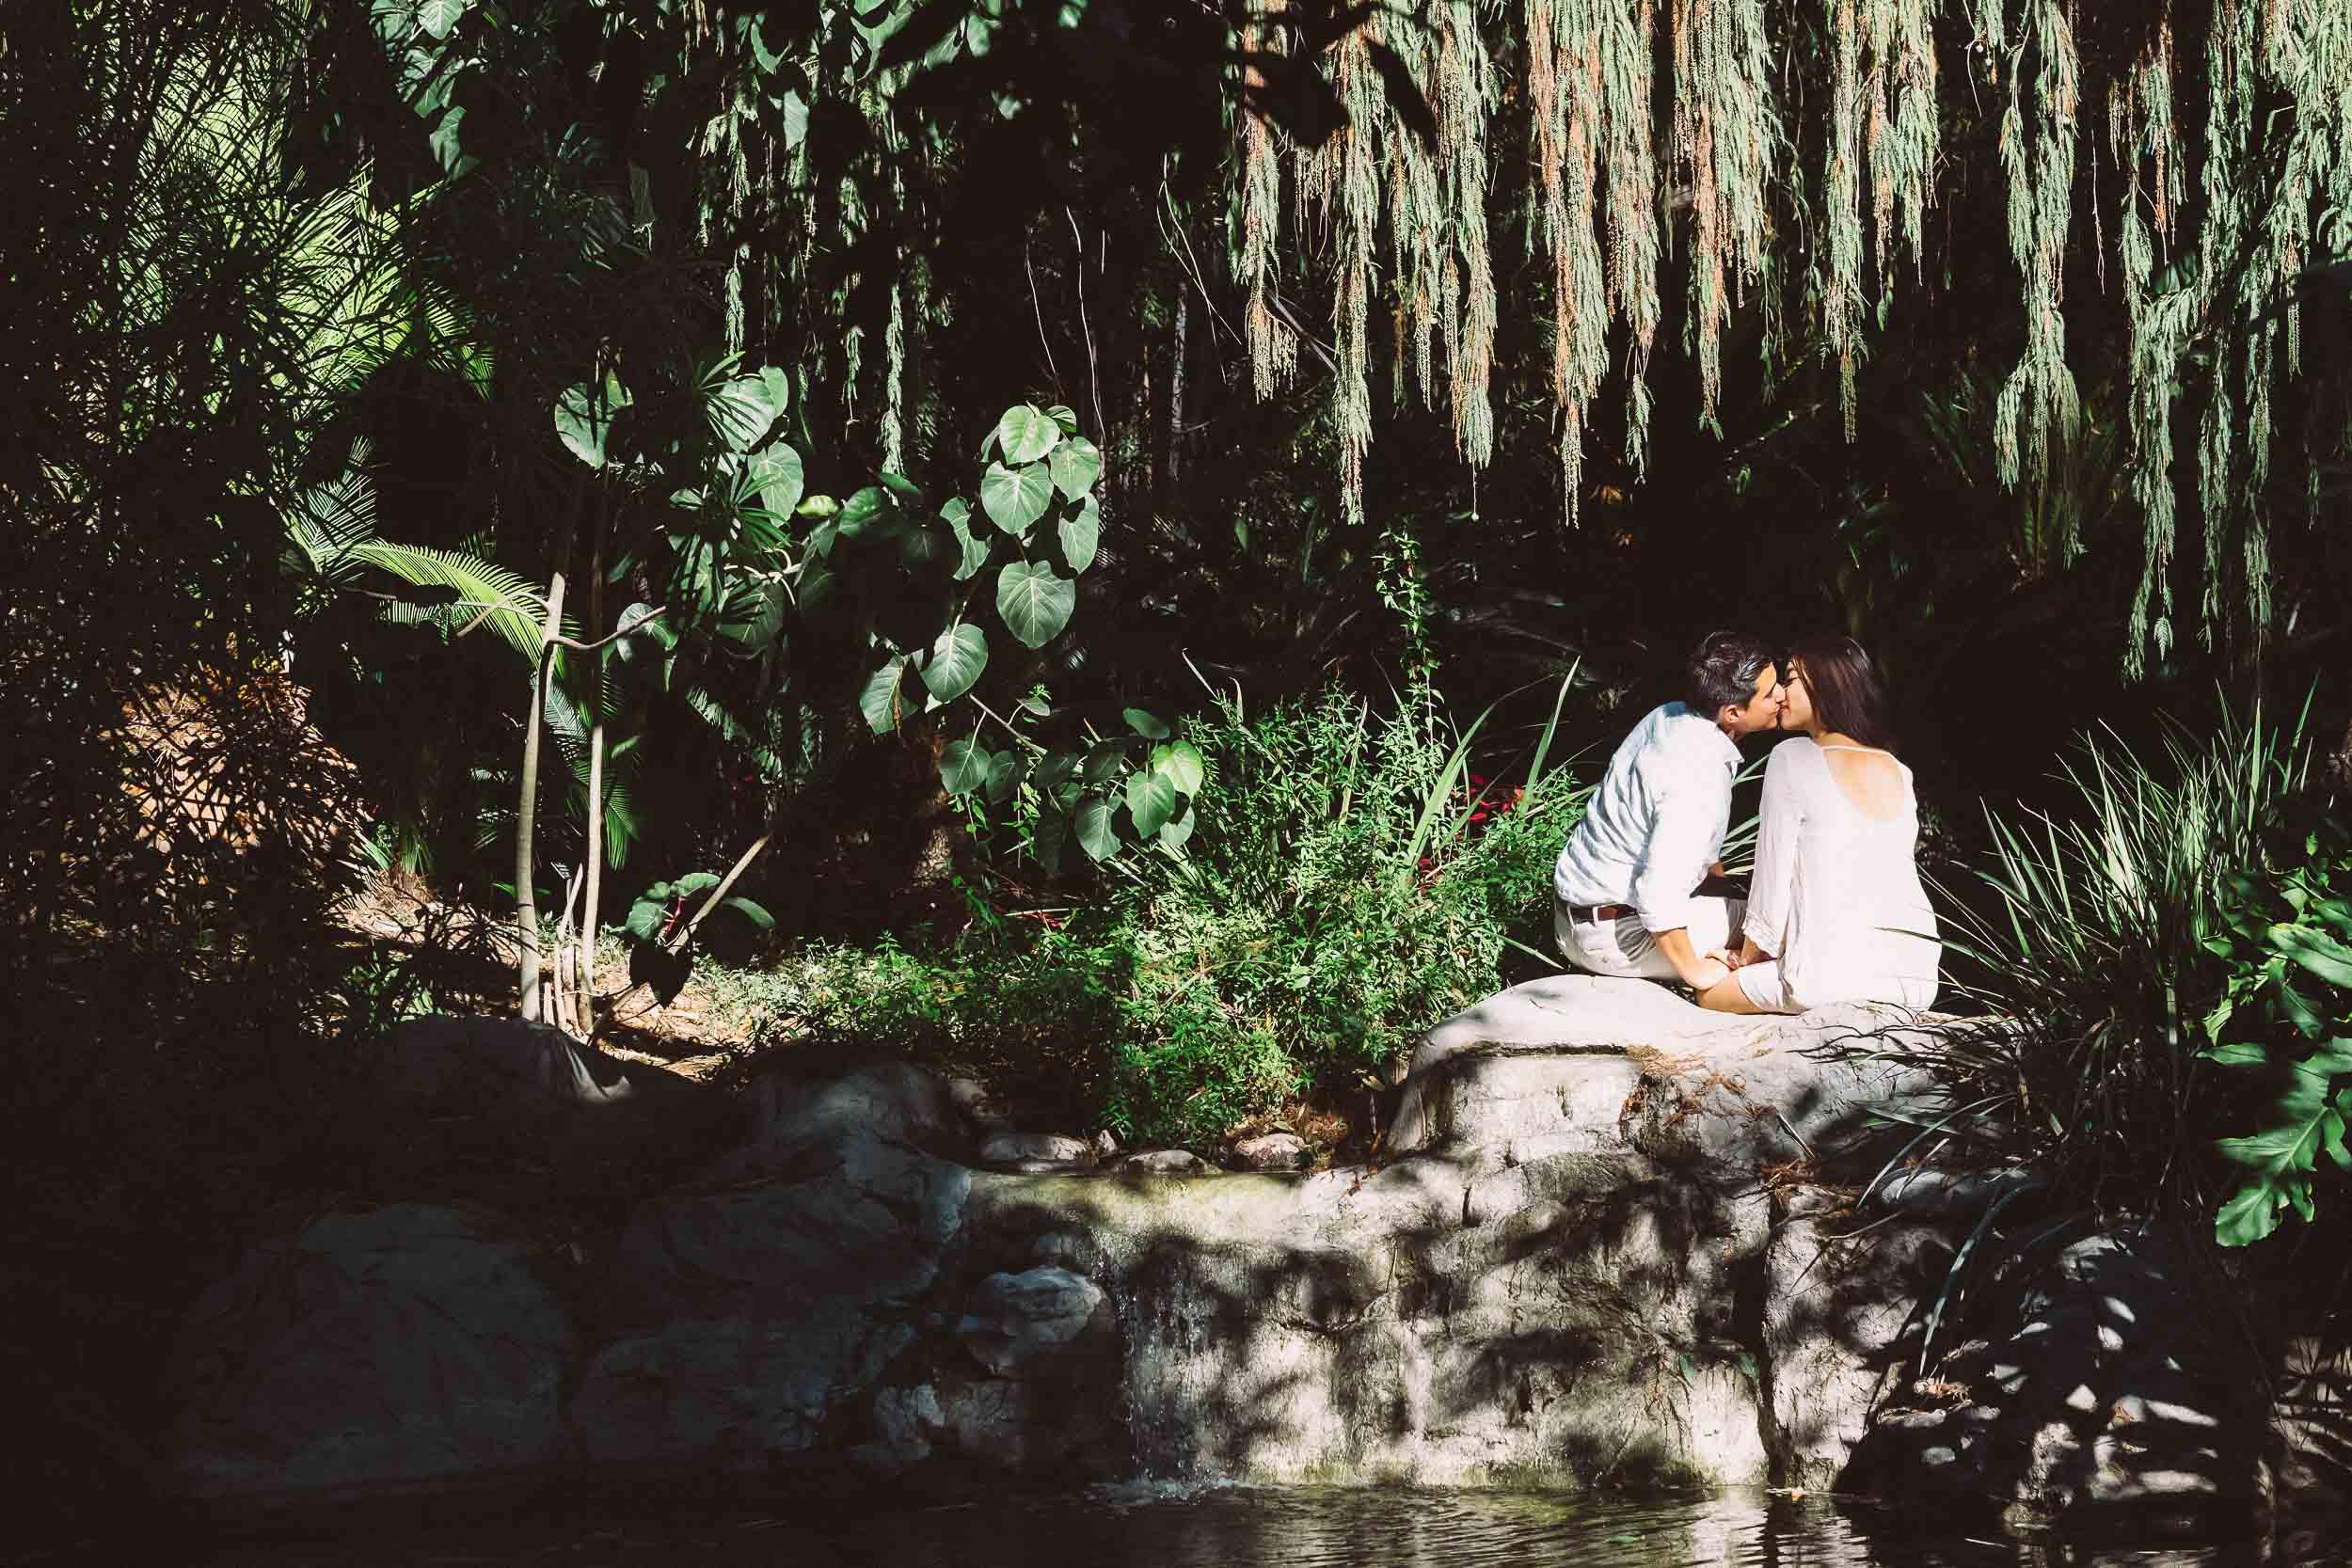 Bryan-Miraflor-Photography-Suzie-Victor-Engagement-Los-Angeles-Arboretum-20151121-0077.jpg